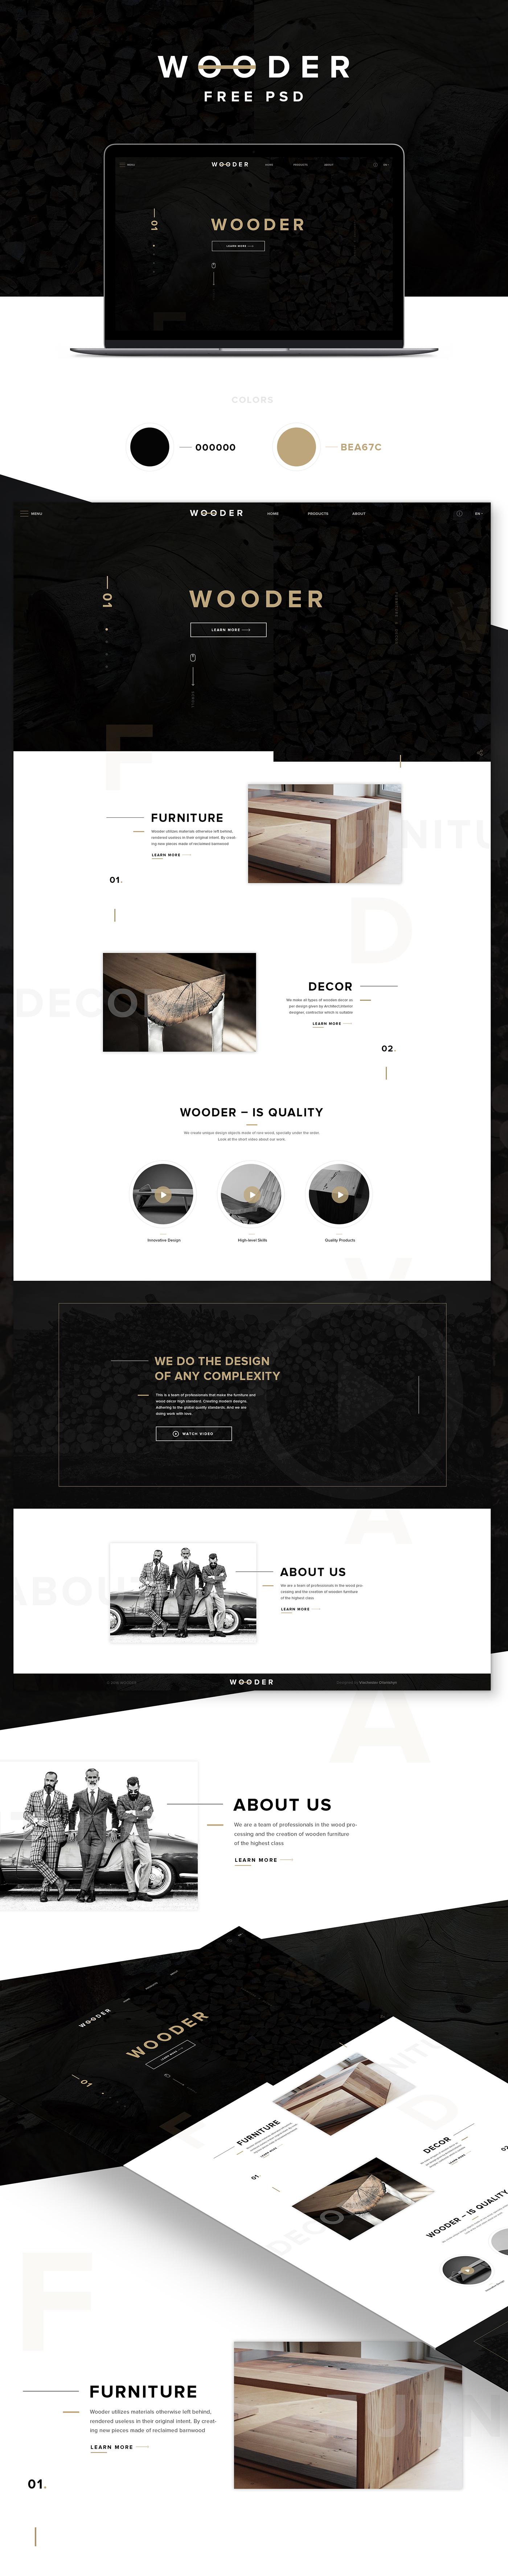 wood free psd freebie template Layout Web site black download Mockup minimal Minimalism gold free psd